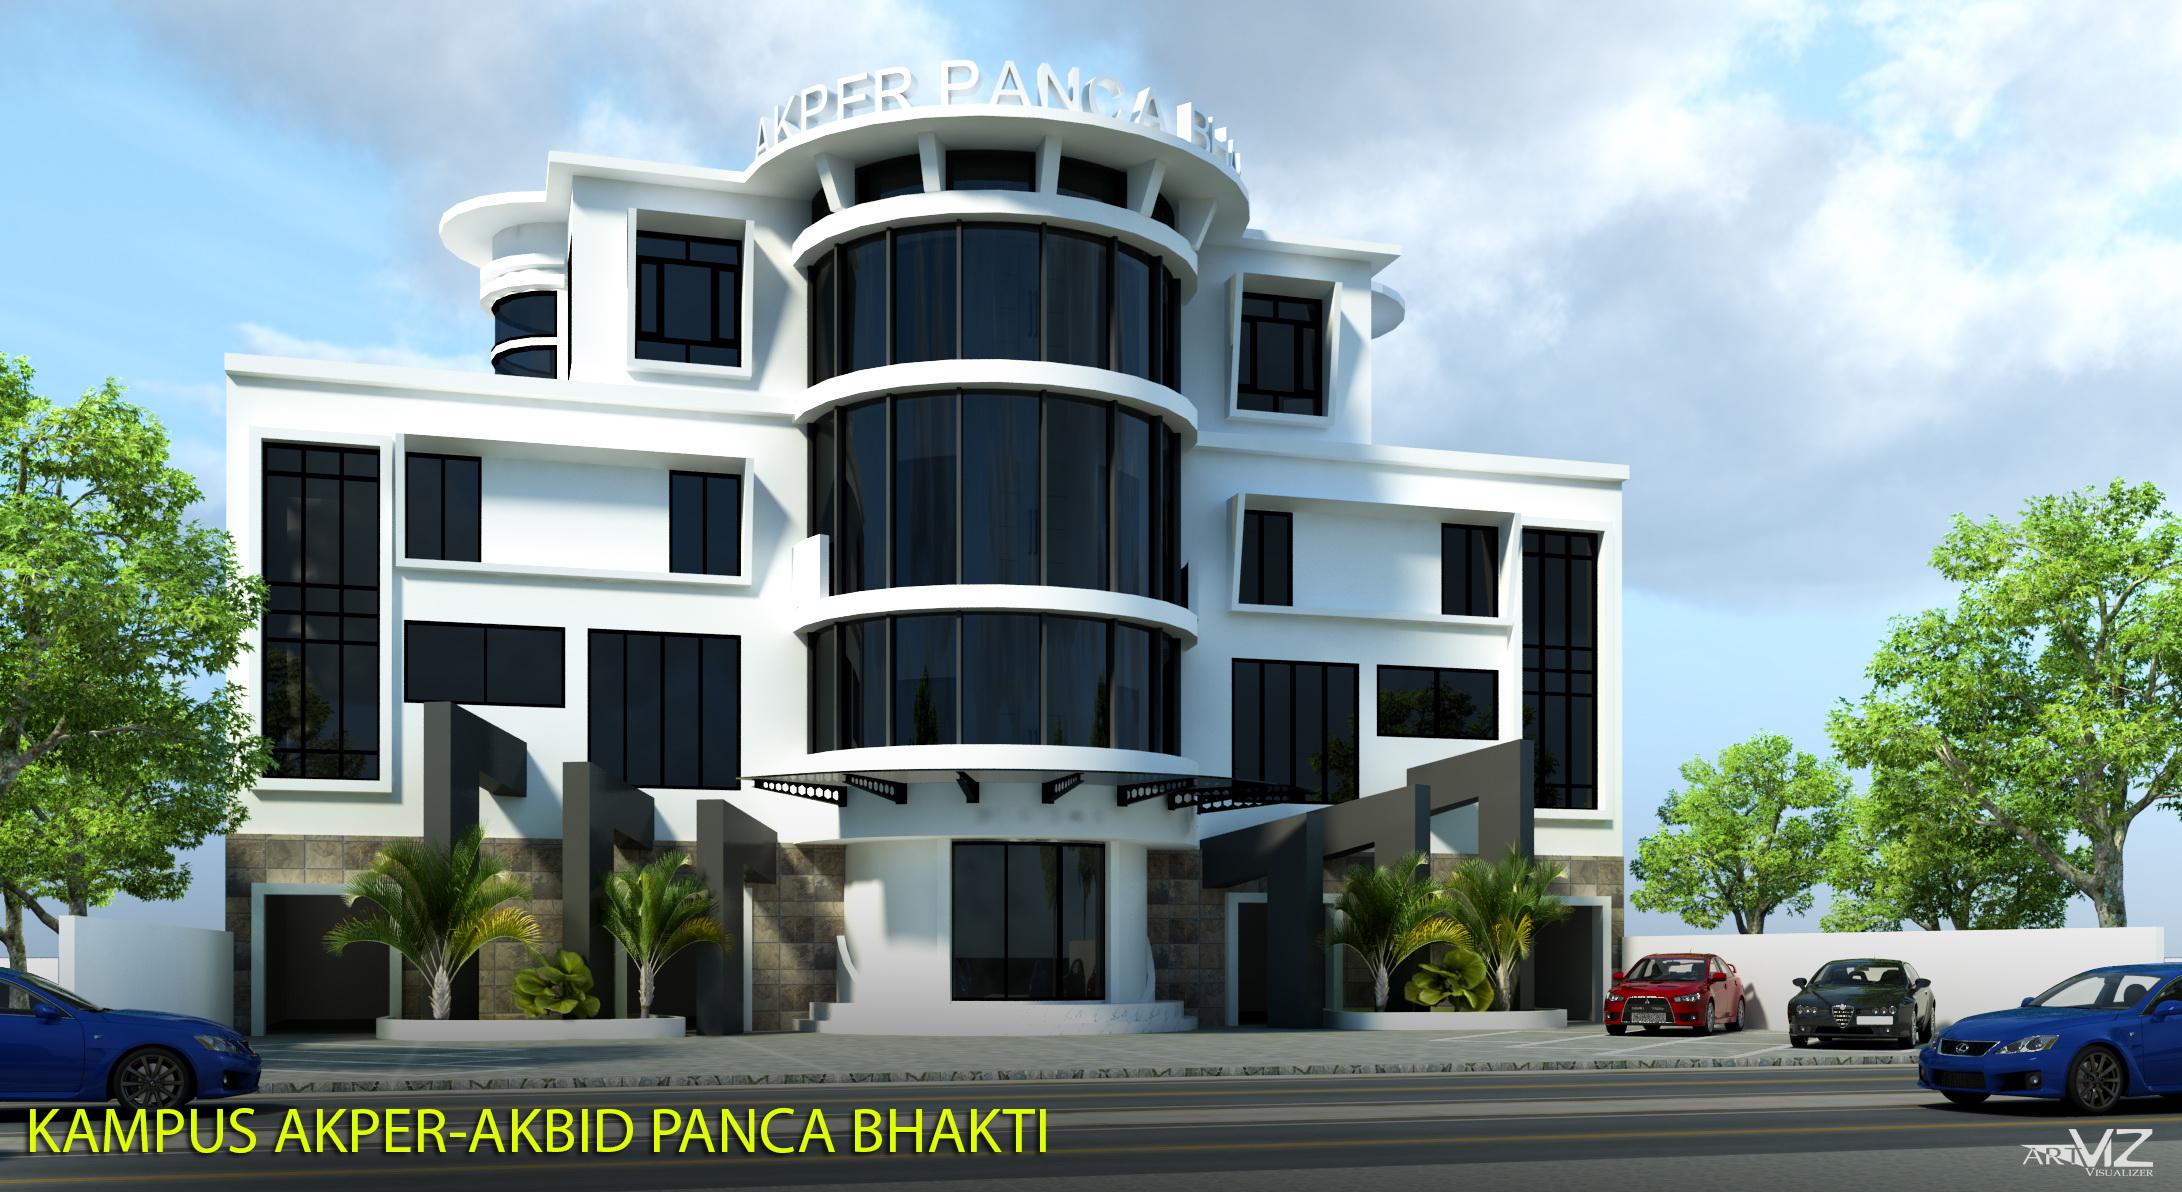 Akademi Keperawatan dan Akademi Kebidanan Panca Bhakti Bandar Lampung